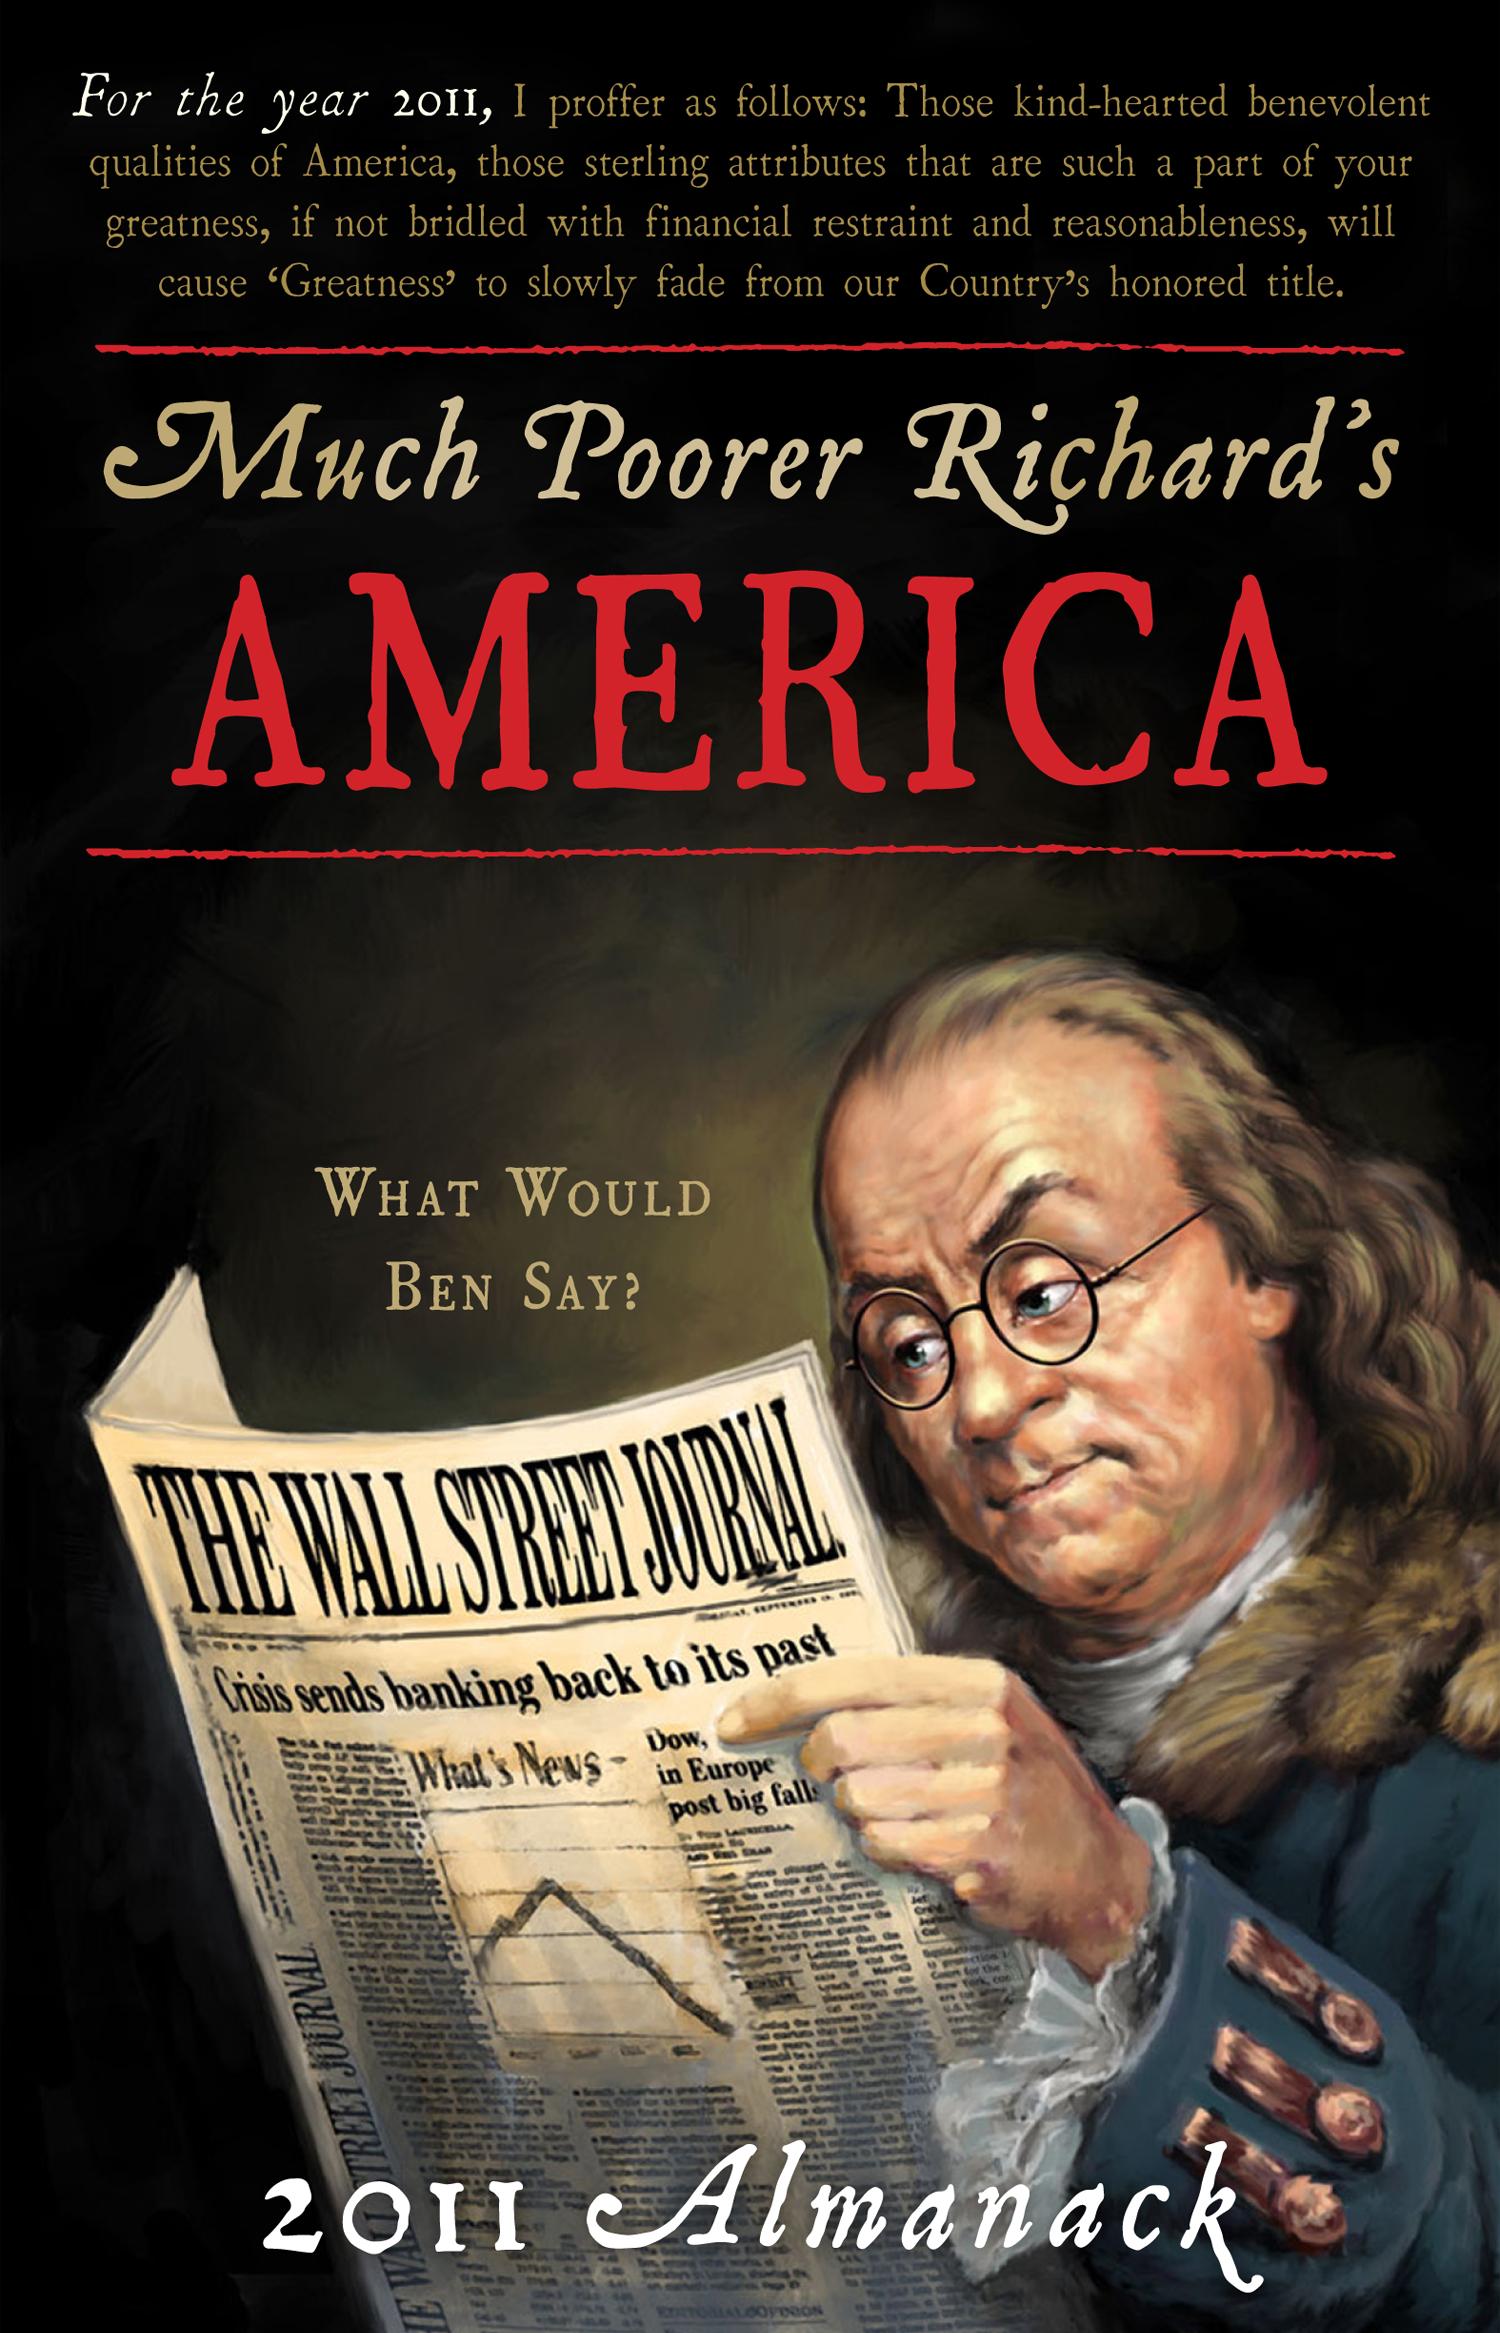 MUCH-POORER-RICHARDS-AMERICA-comp2-ss6.jpg